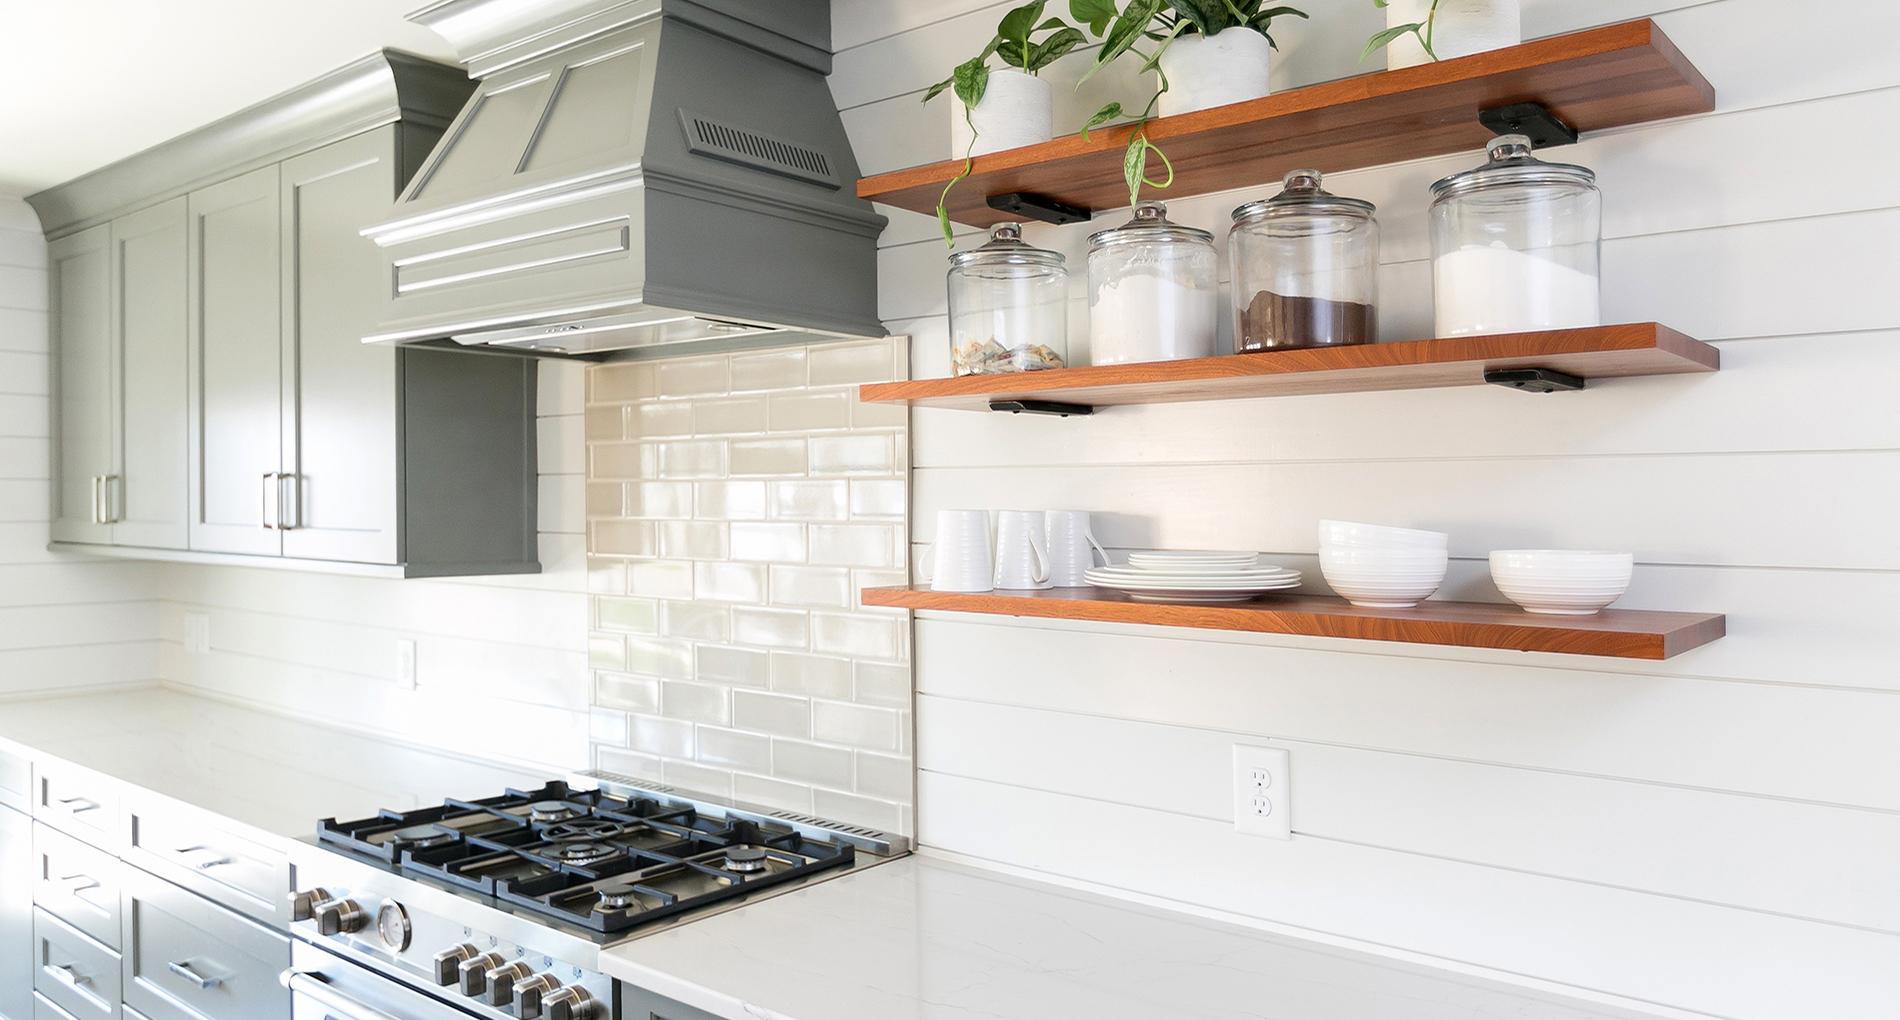 summerville-middlestreet-remodel-kitchen1-